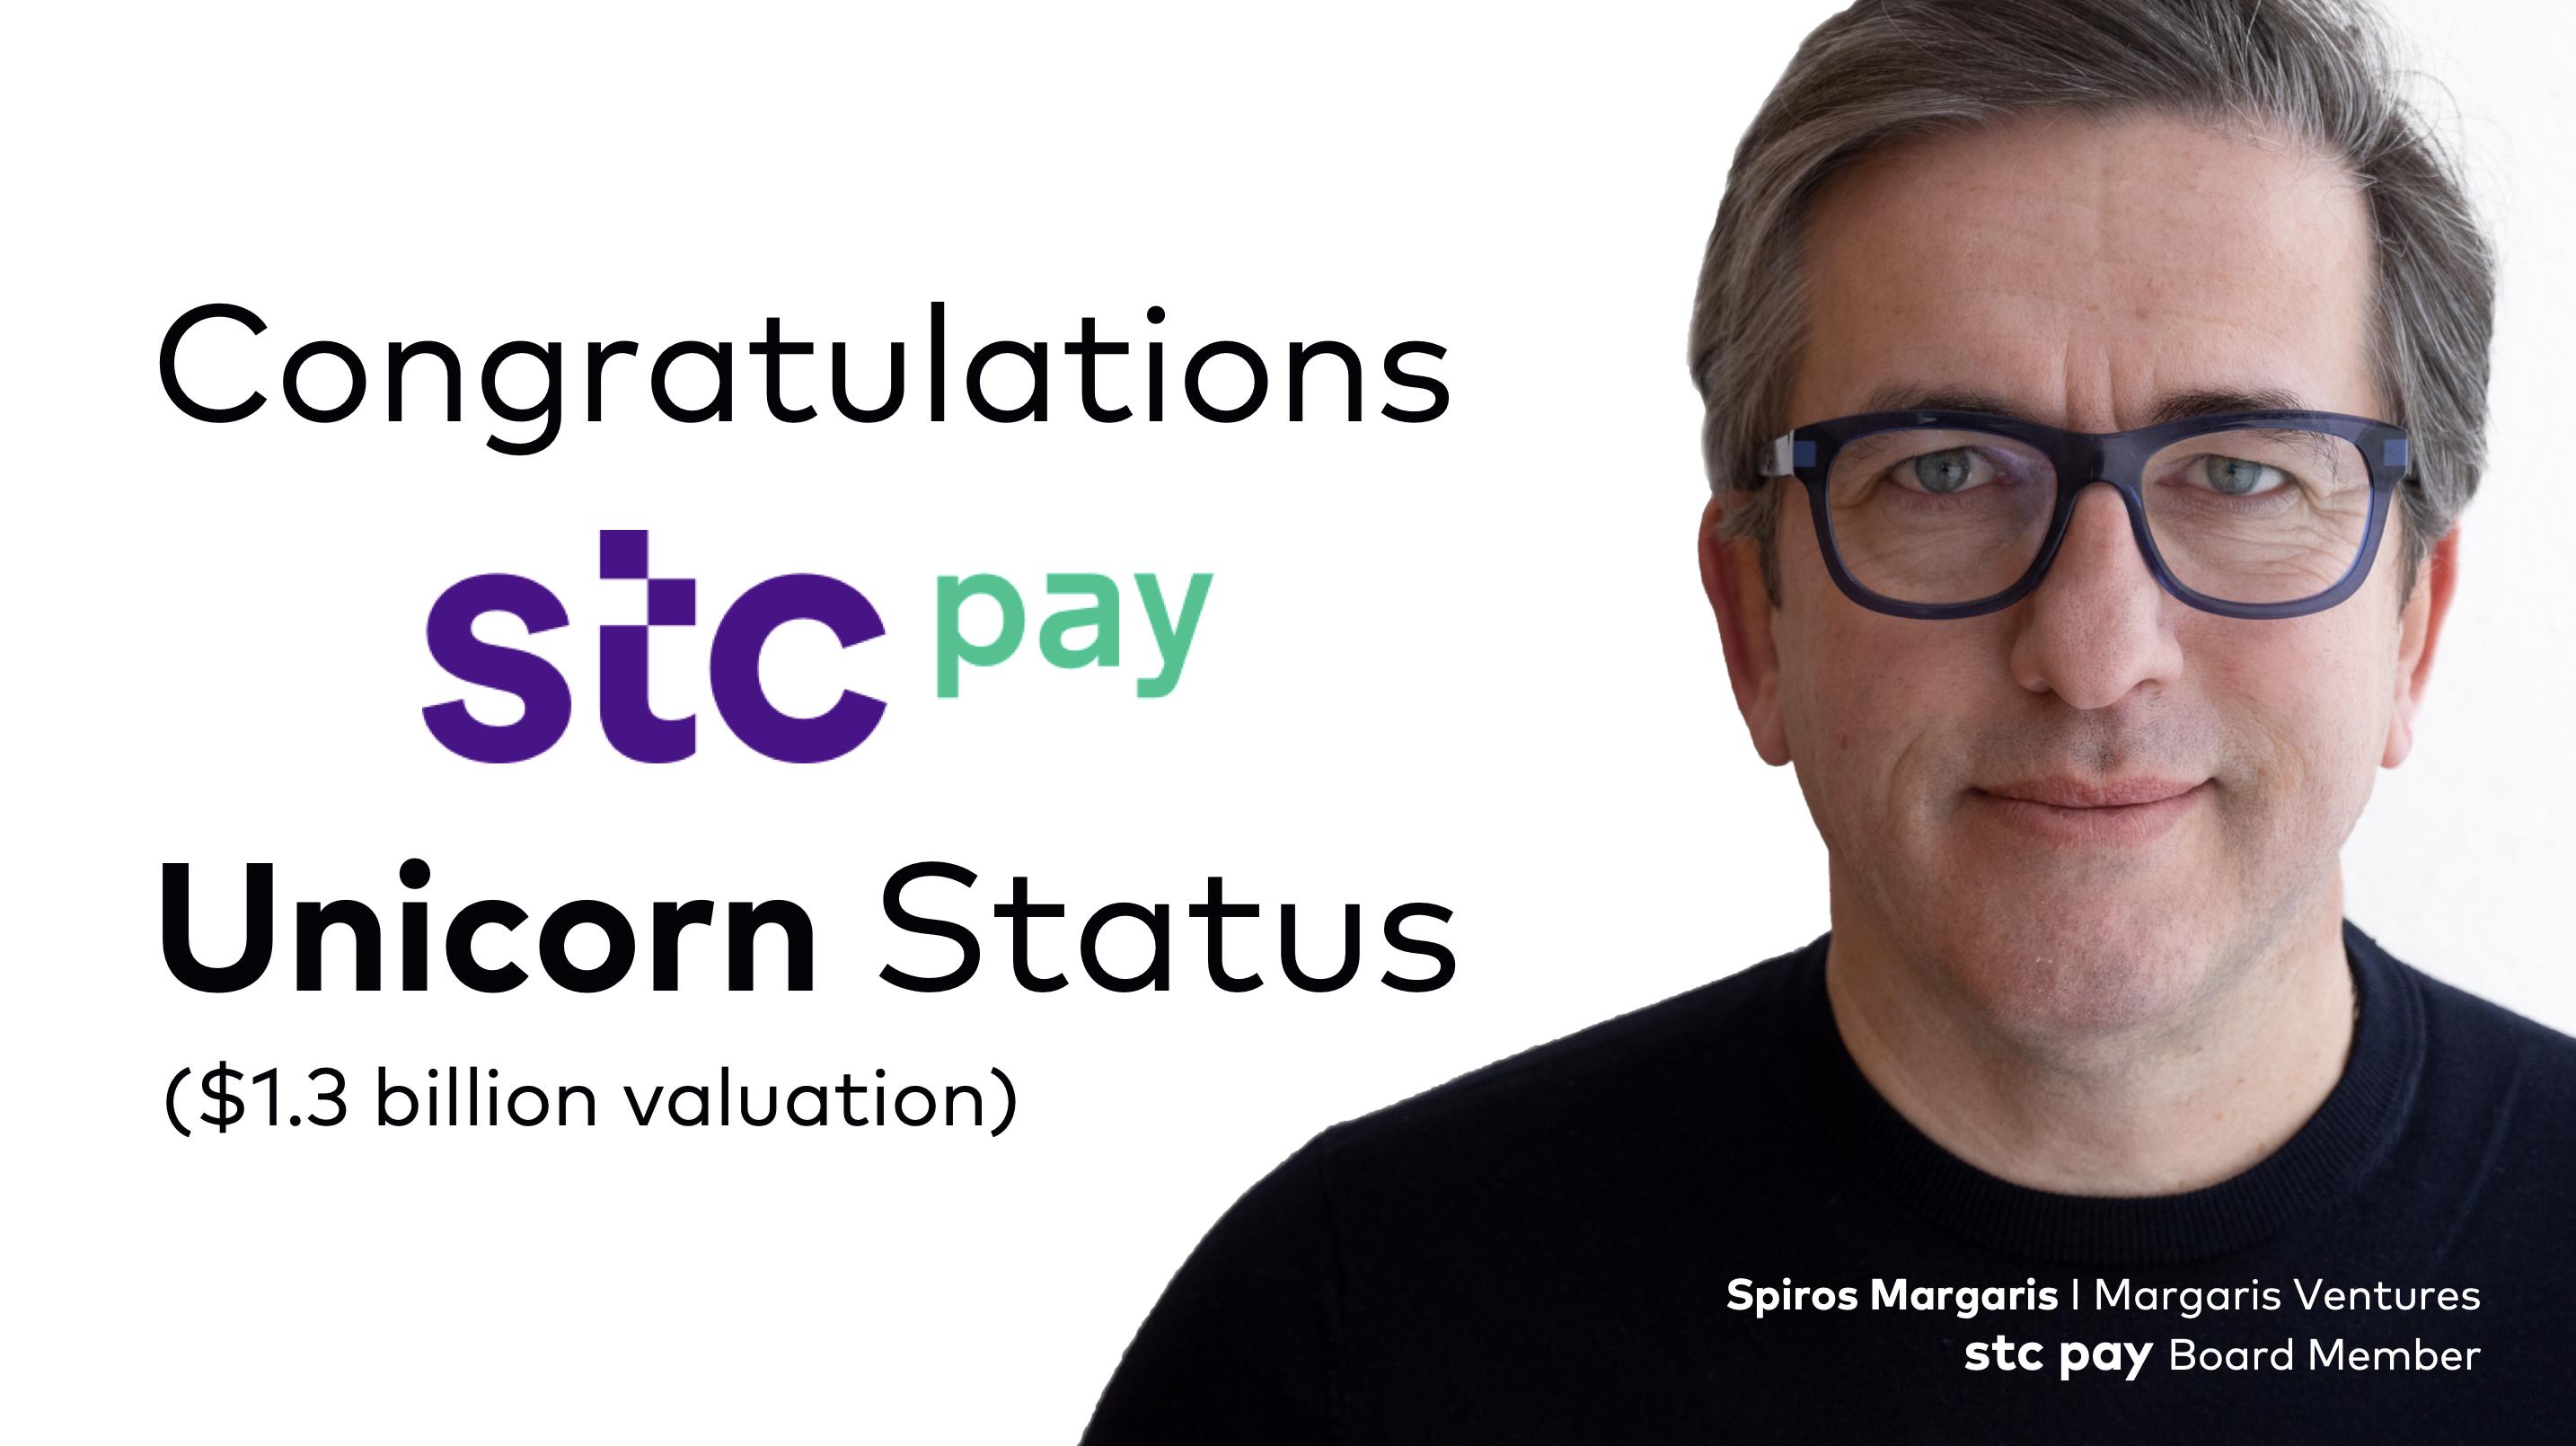 2020 11 21 stc Pay Unicorn valuation - S